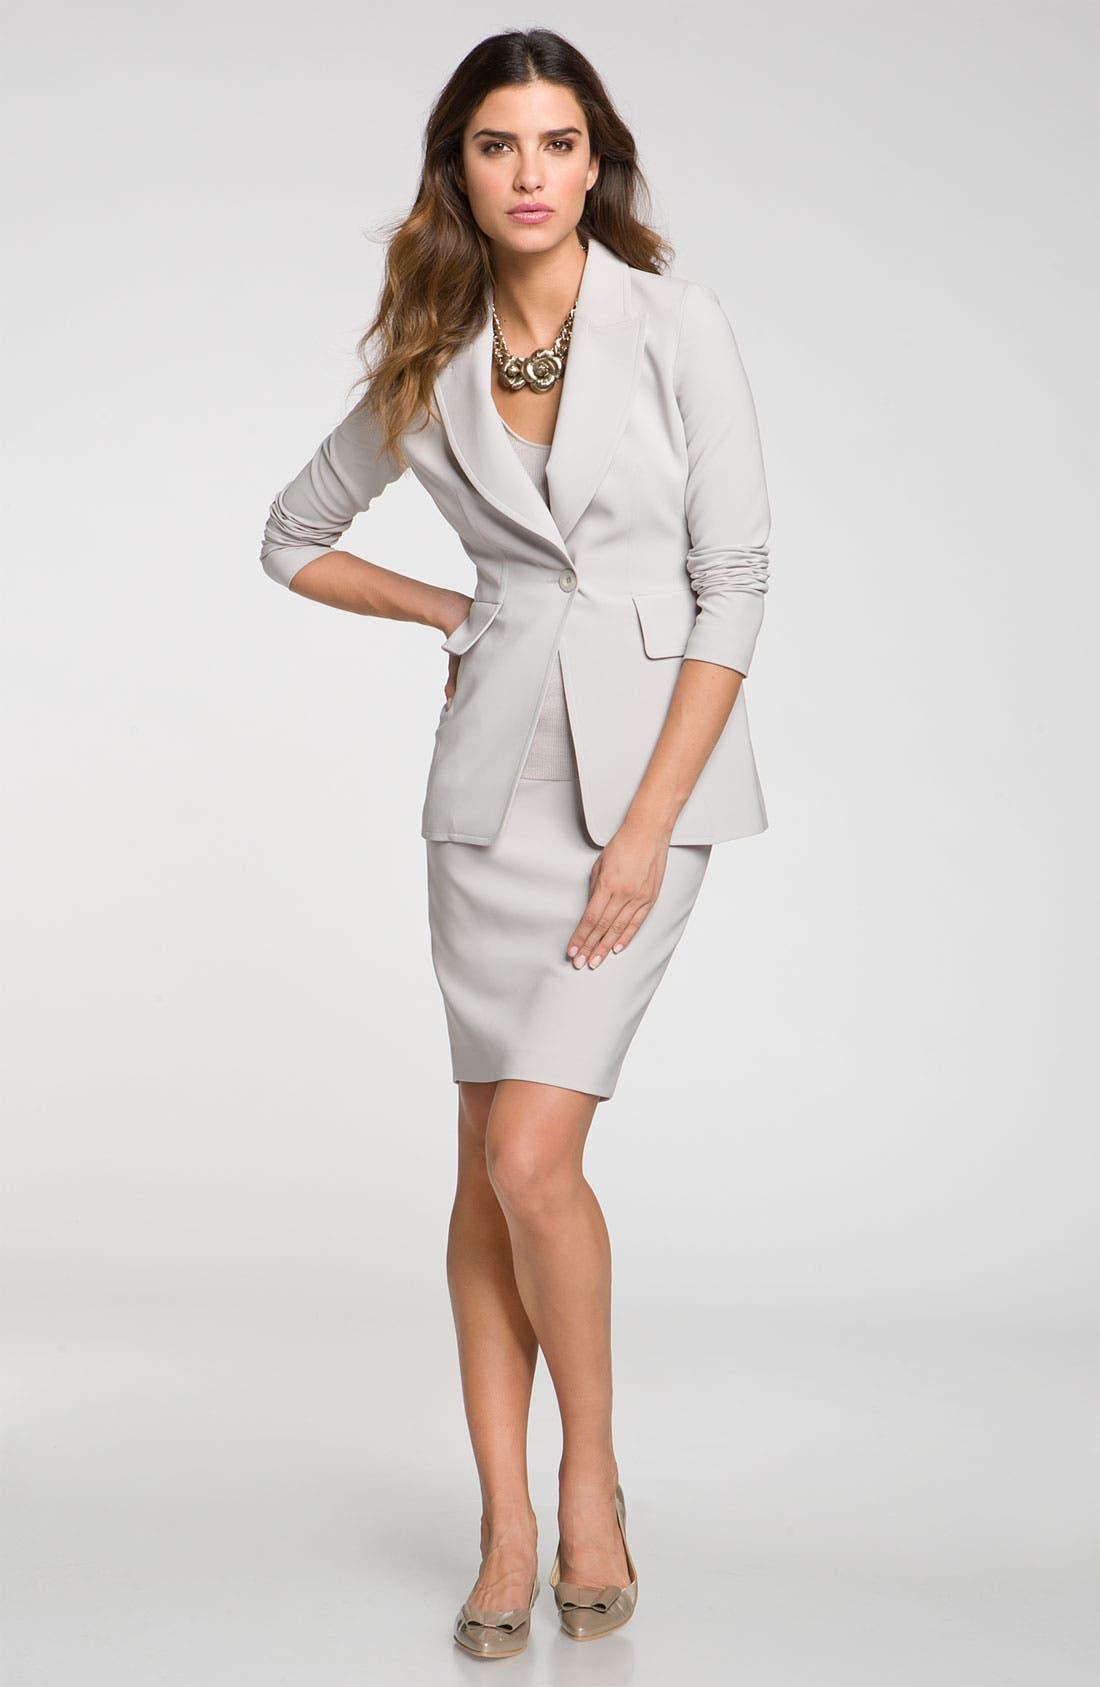 Main Image - St. John Collection Blazer & Skirt